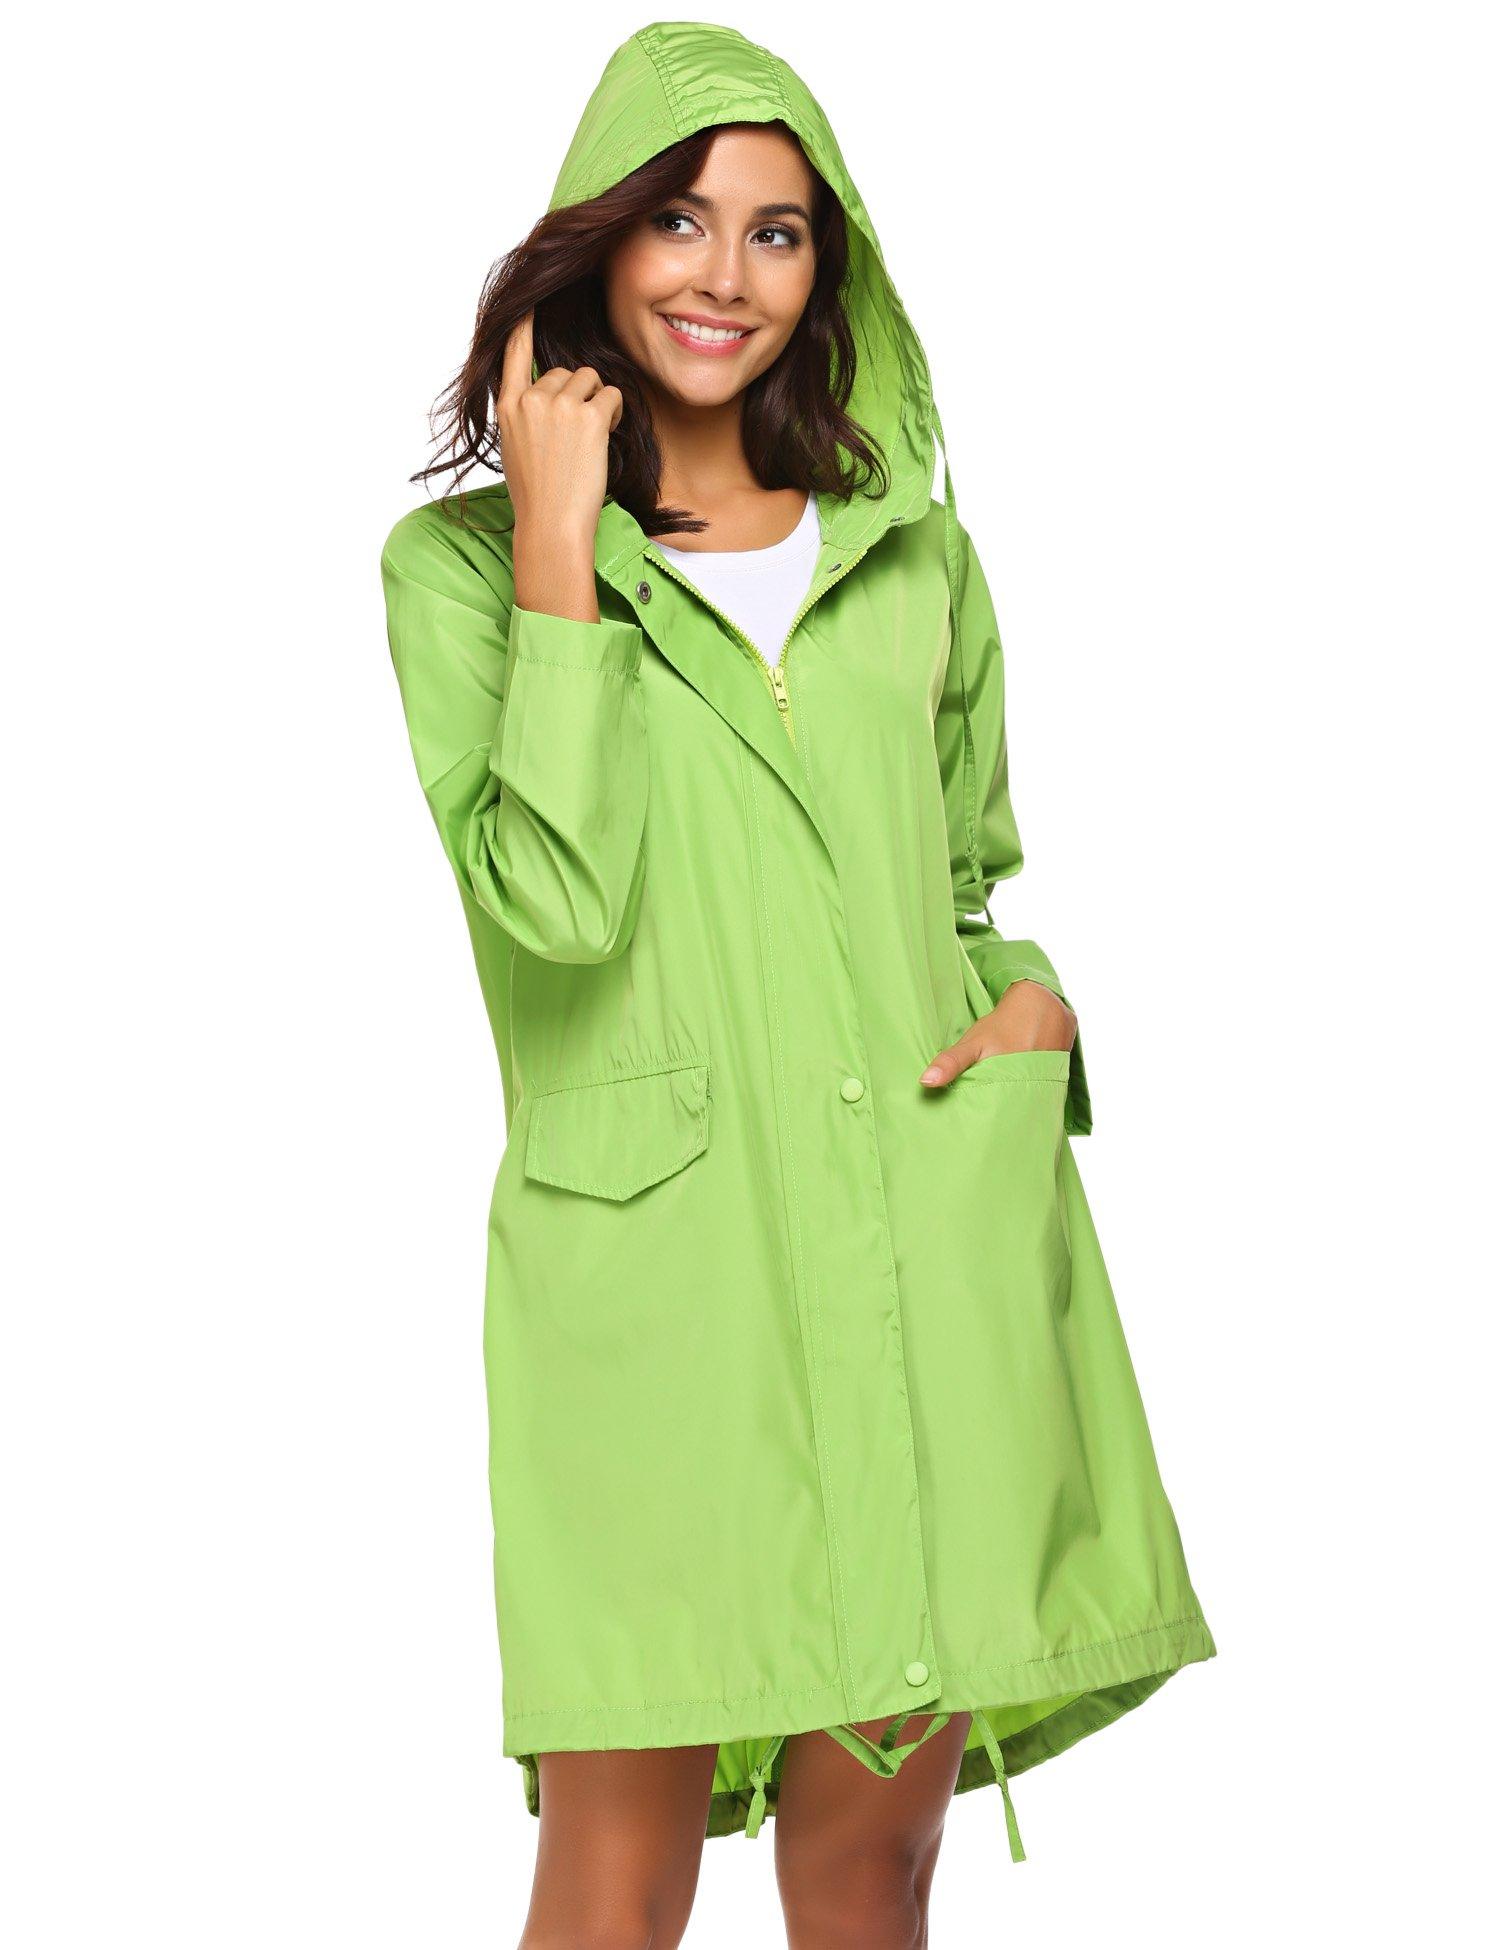 Teewanna Womens Lightweight Travel Trench Waterproof Raincoat Hoodie Windproof Hiking Coat Packable Rain Jacket (Green L)